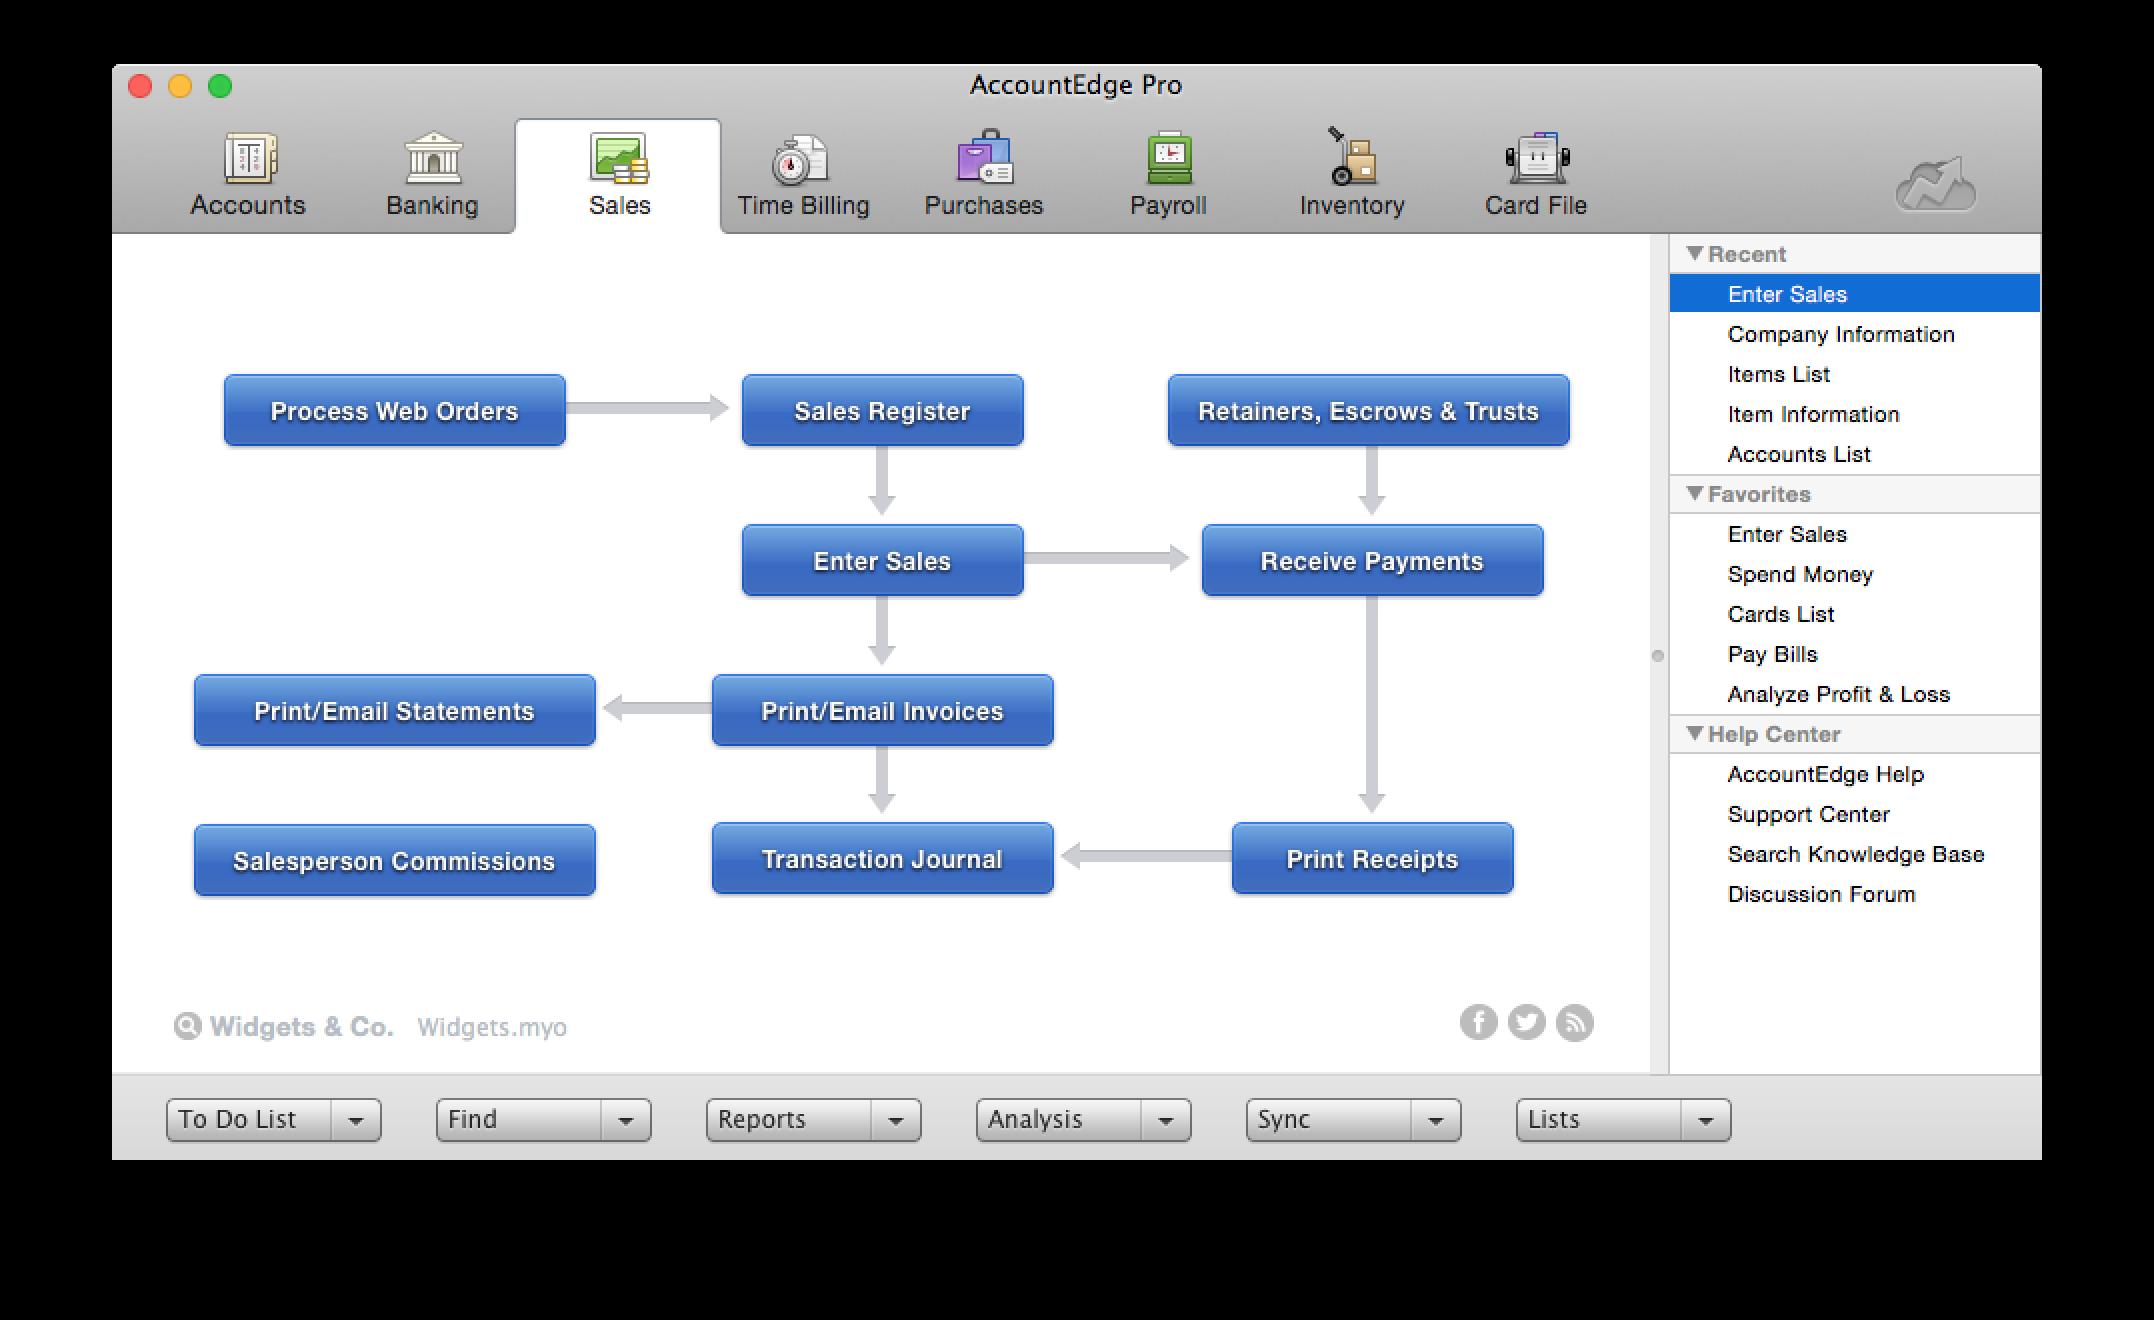 AccountEdge Pro Demo - AccountEdge Sales